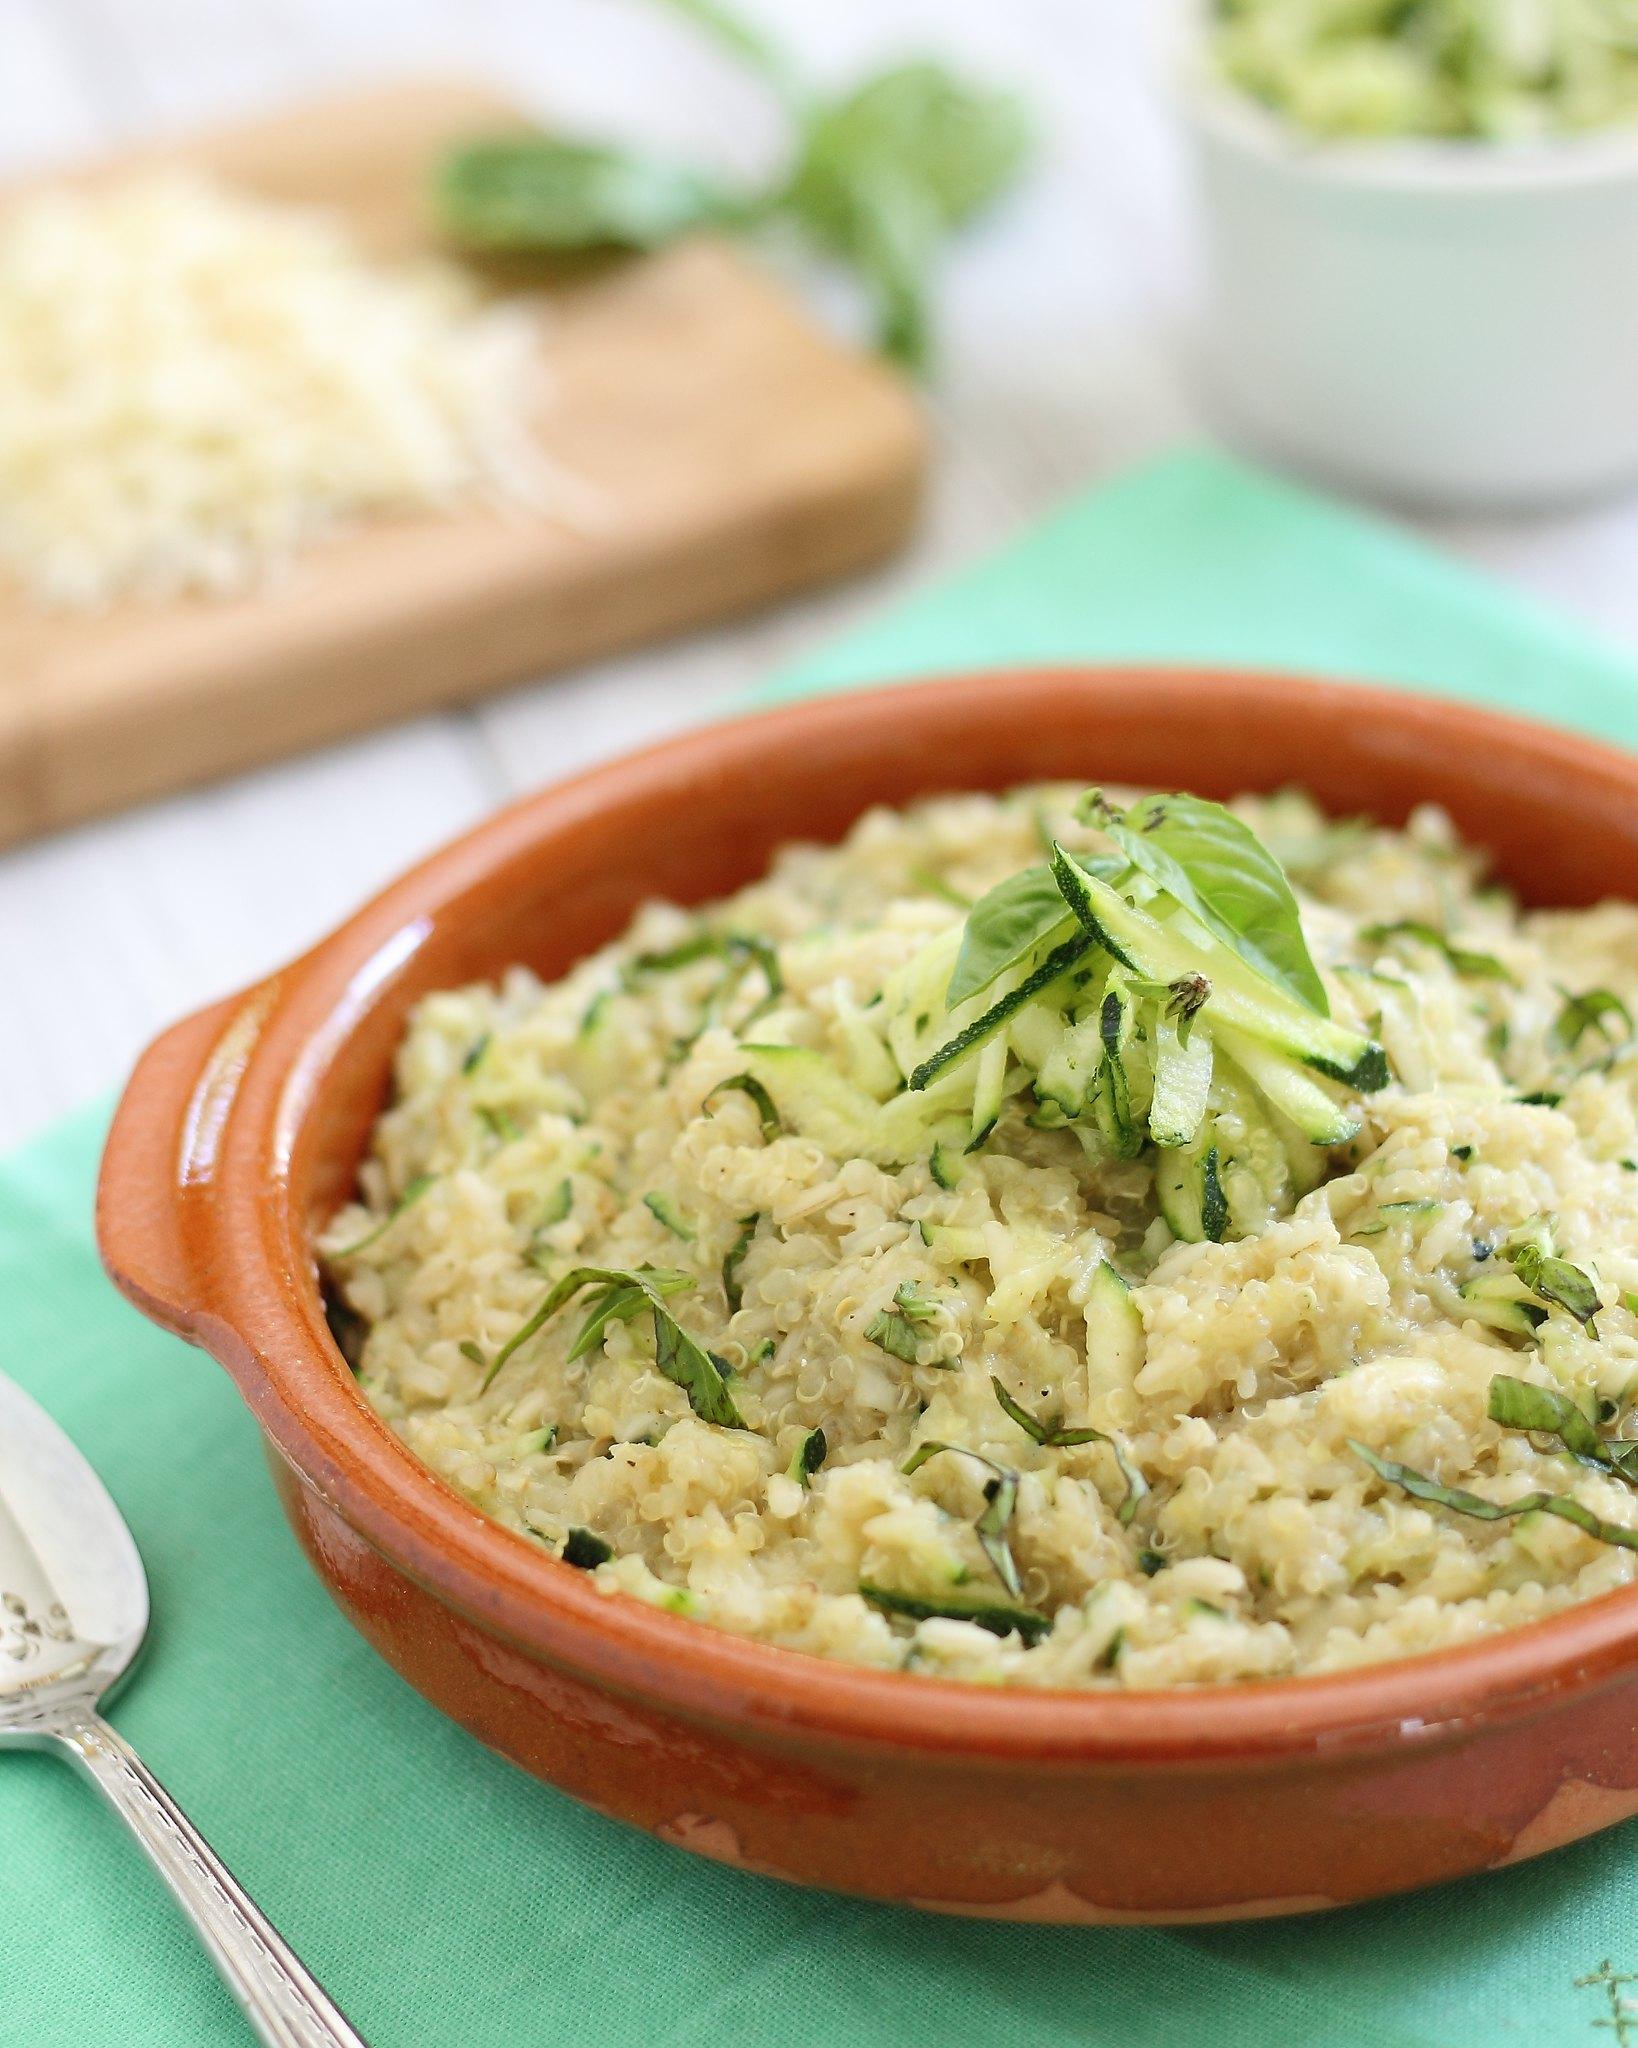 cheesy zucchini quinoa 2 | Flickr - Photo Sharing!